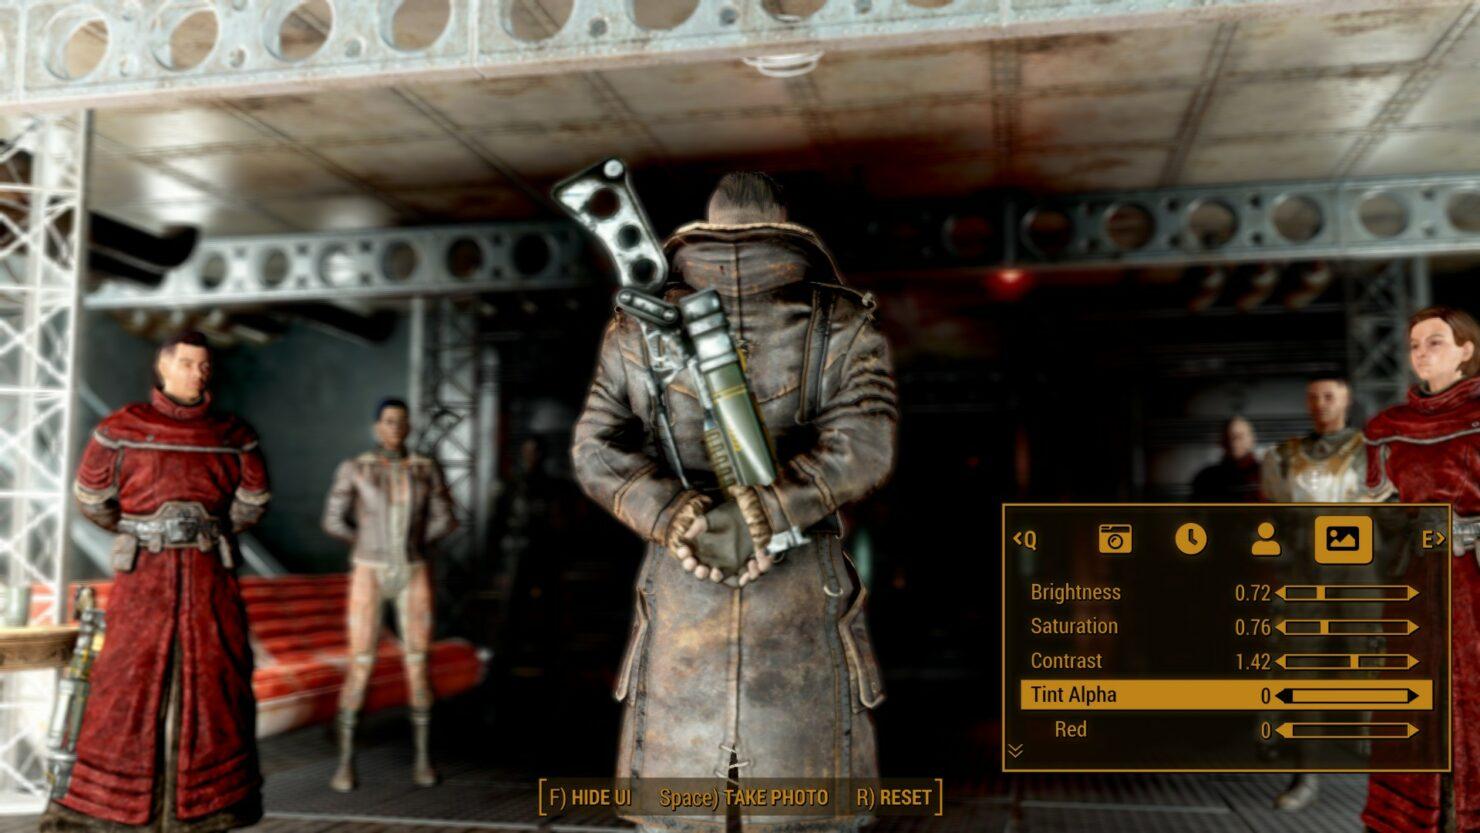 fallout-4-photo-mode-mod-7